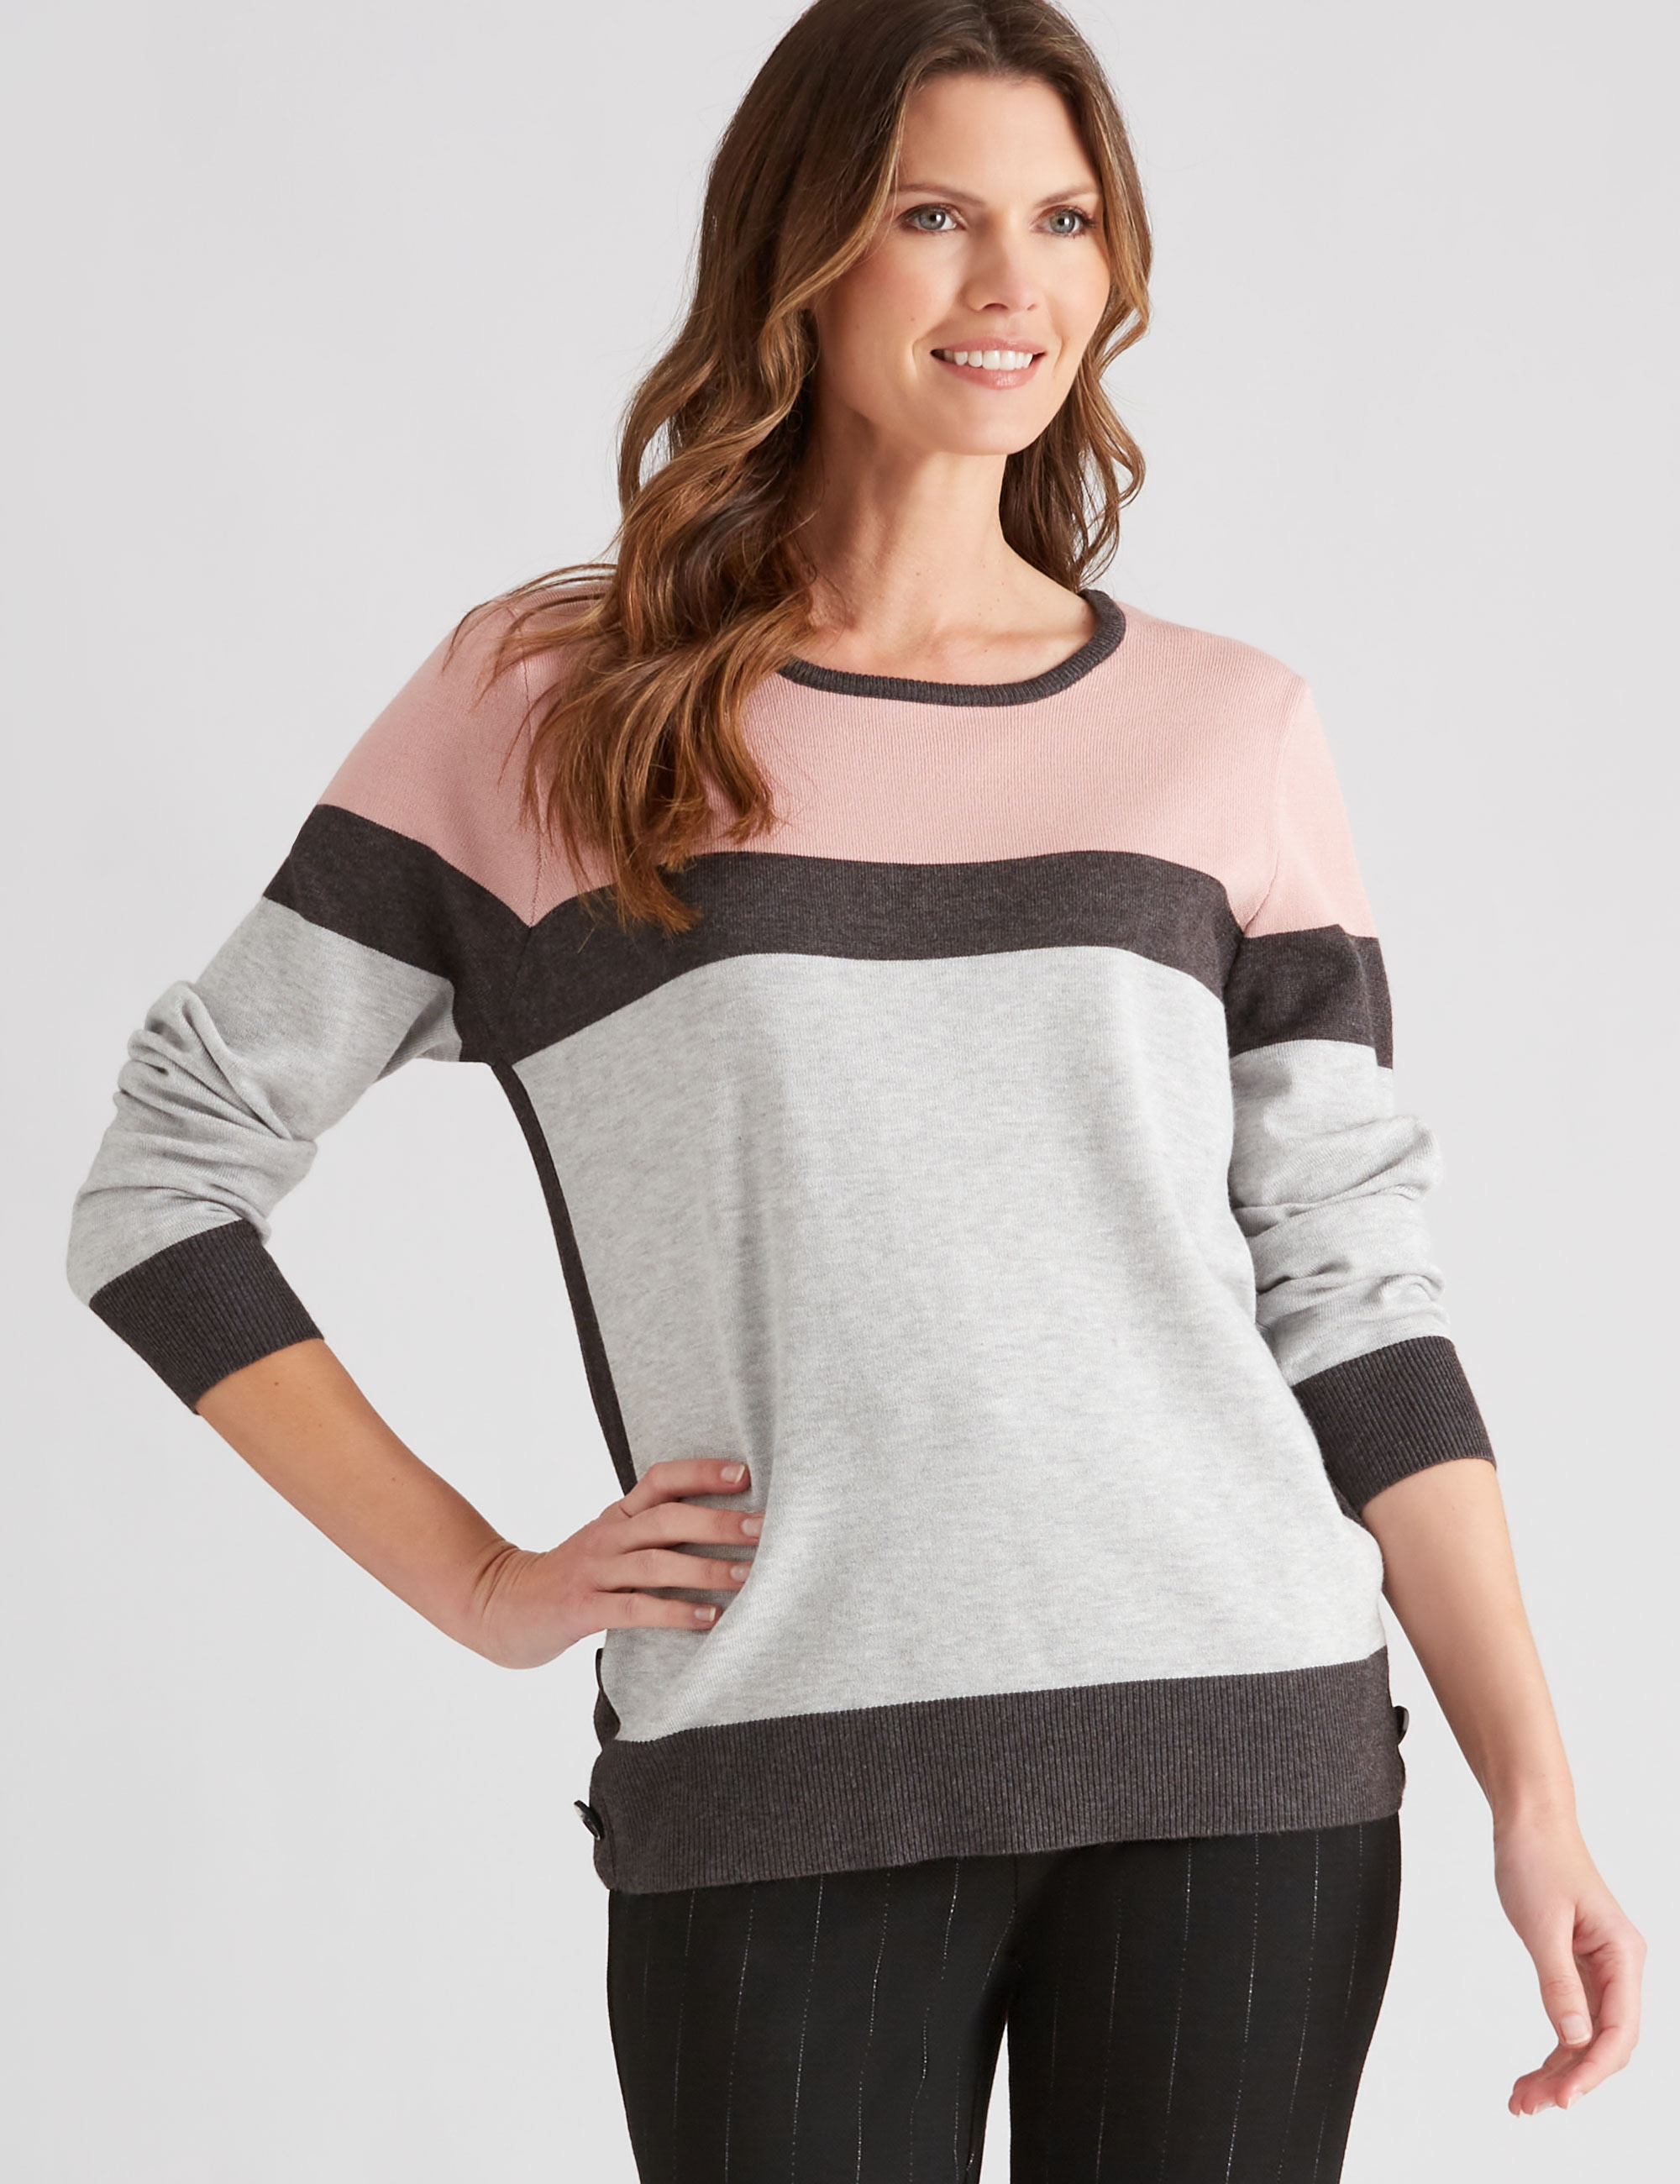 1056459901 1 - Women Fashion